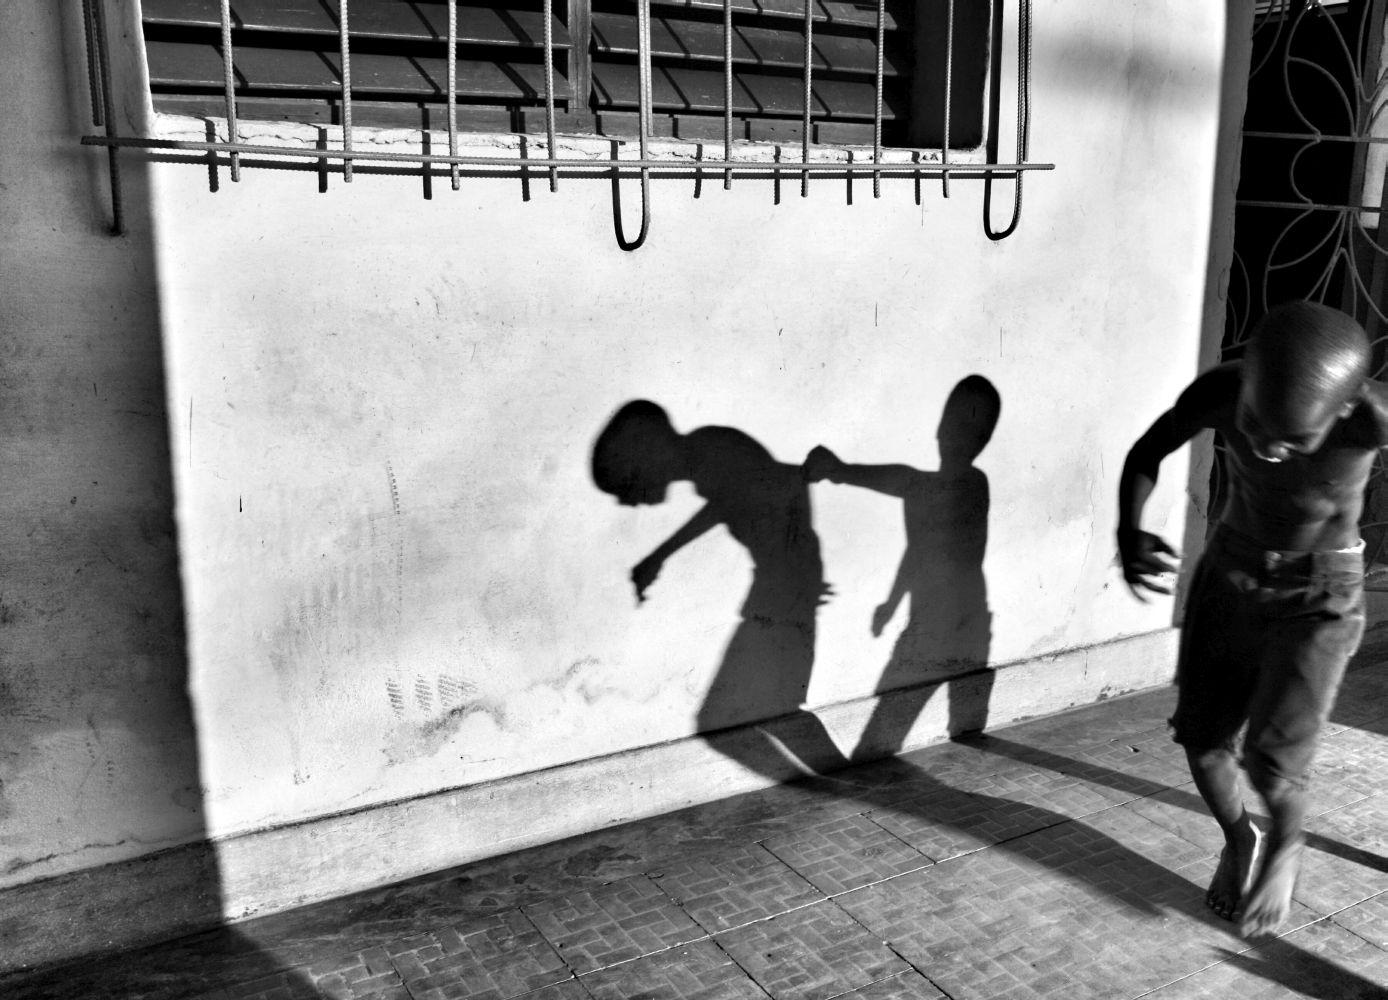 Fotosesej: S fotoaparátom okolo Kuby